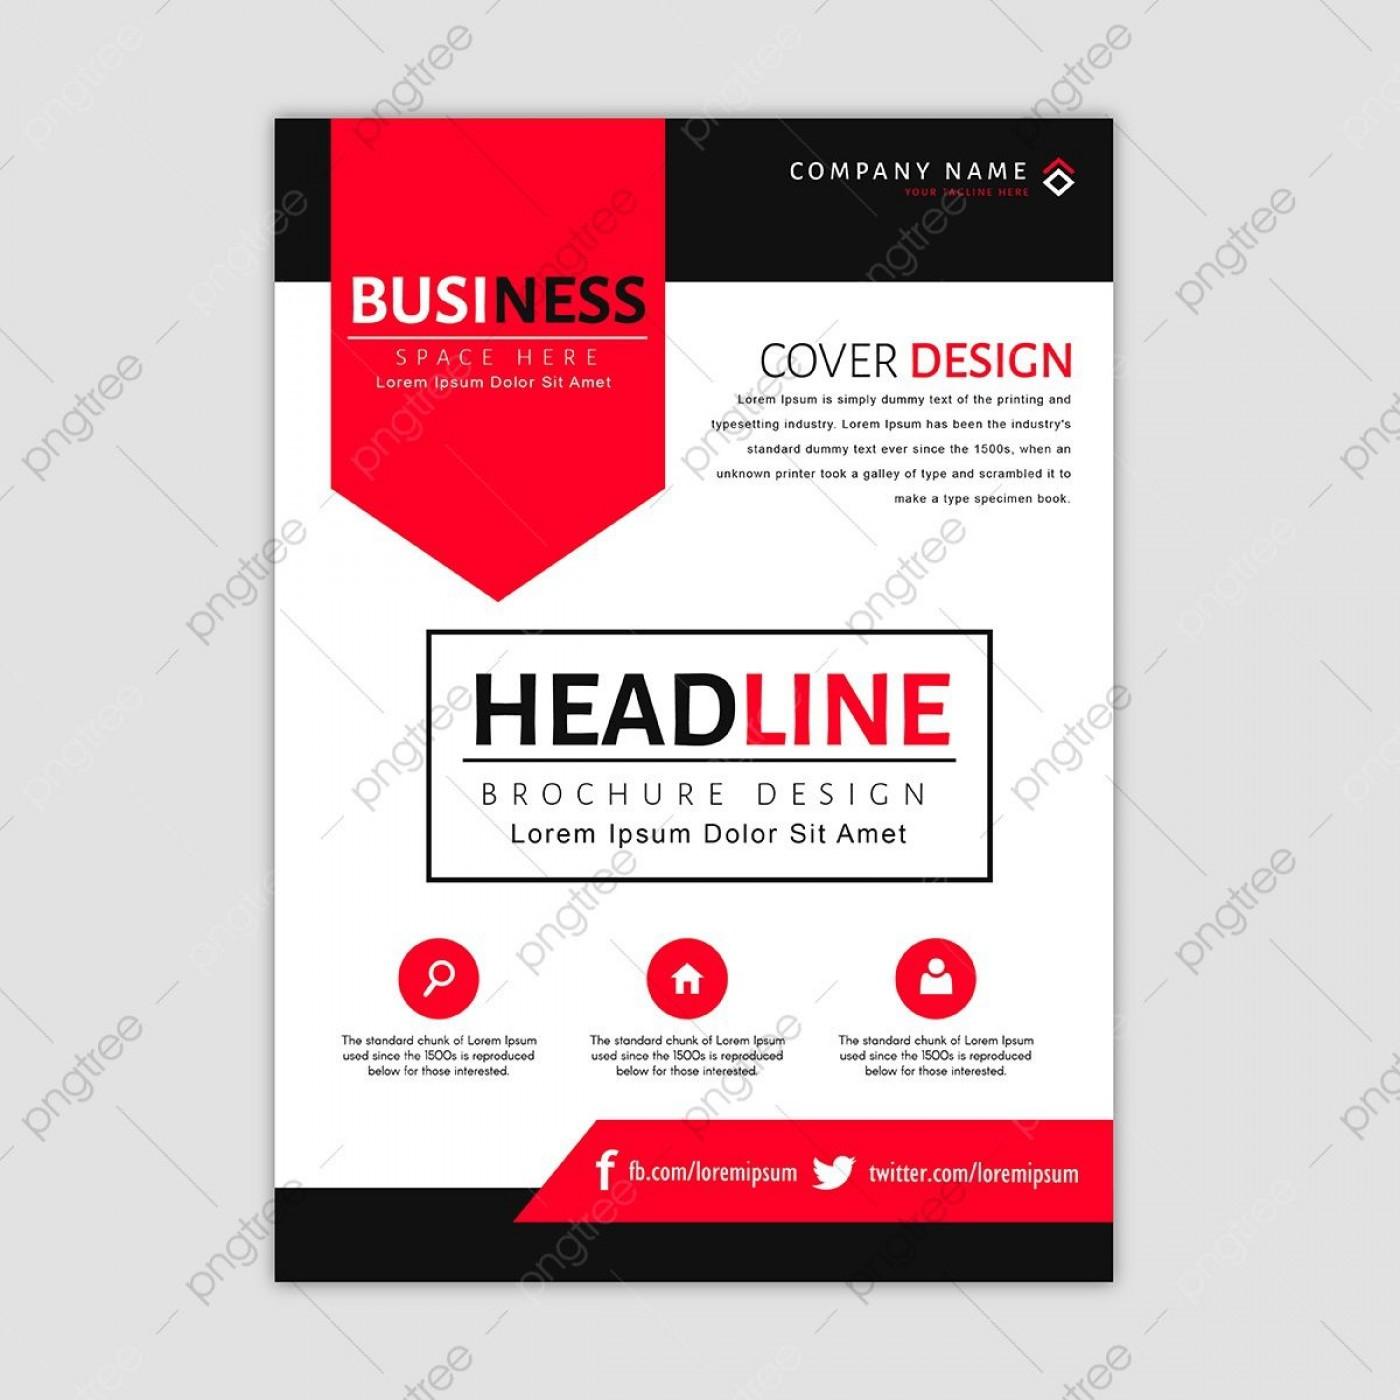 008 Frightening Busines Brochure Design Template Free Download Photo 1400